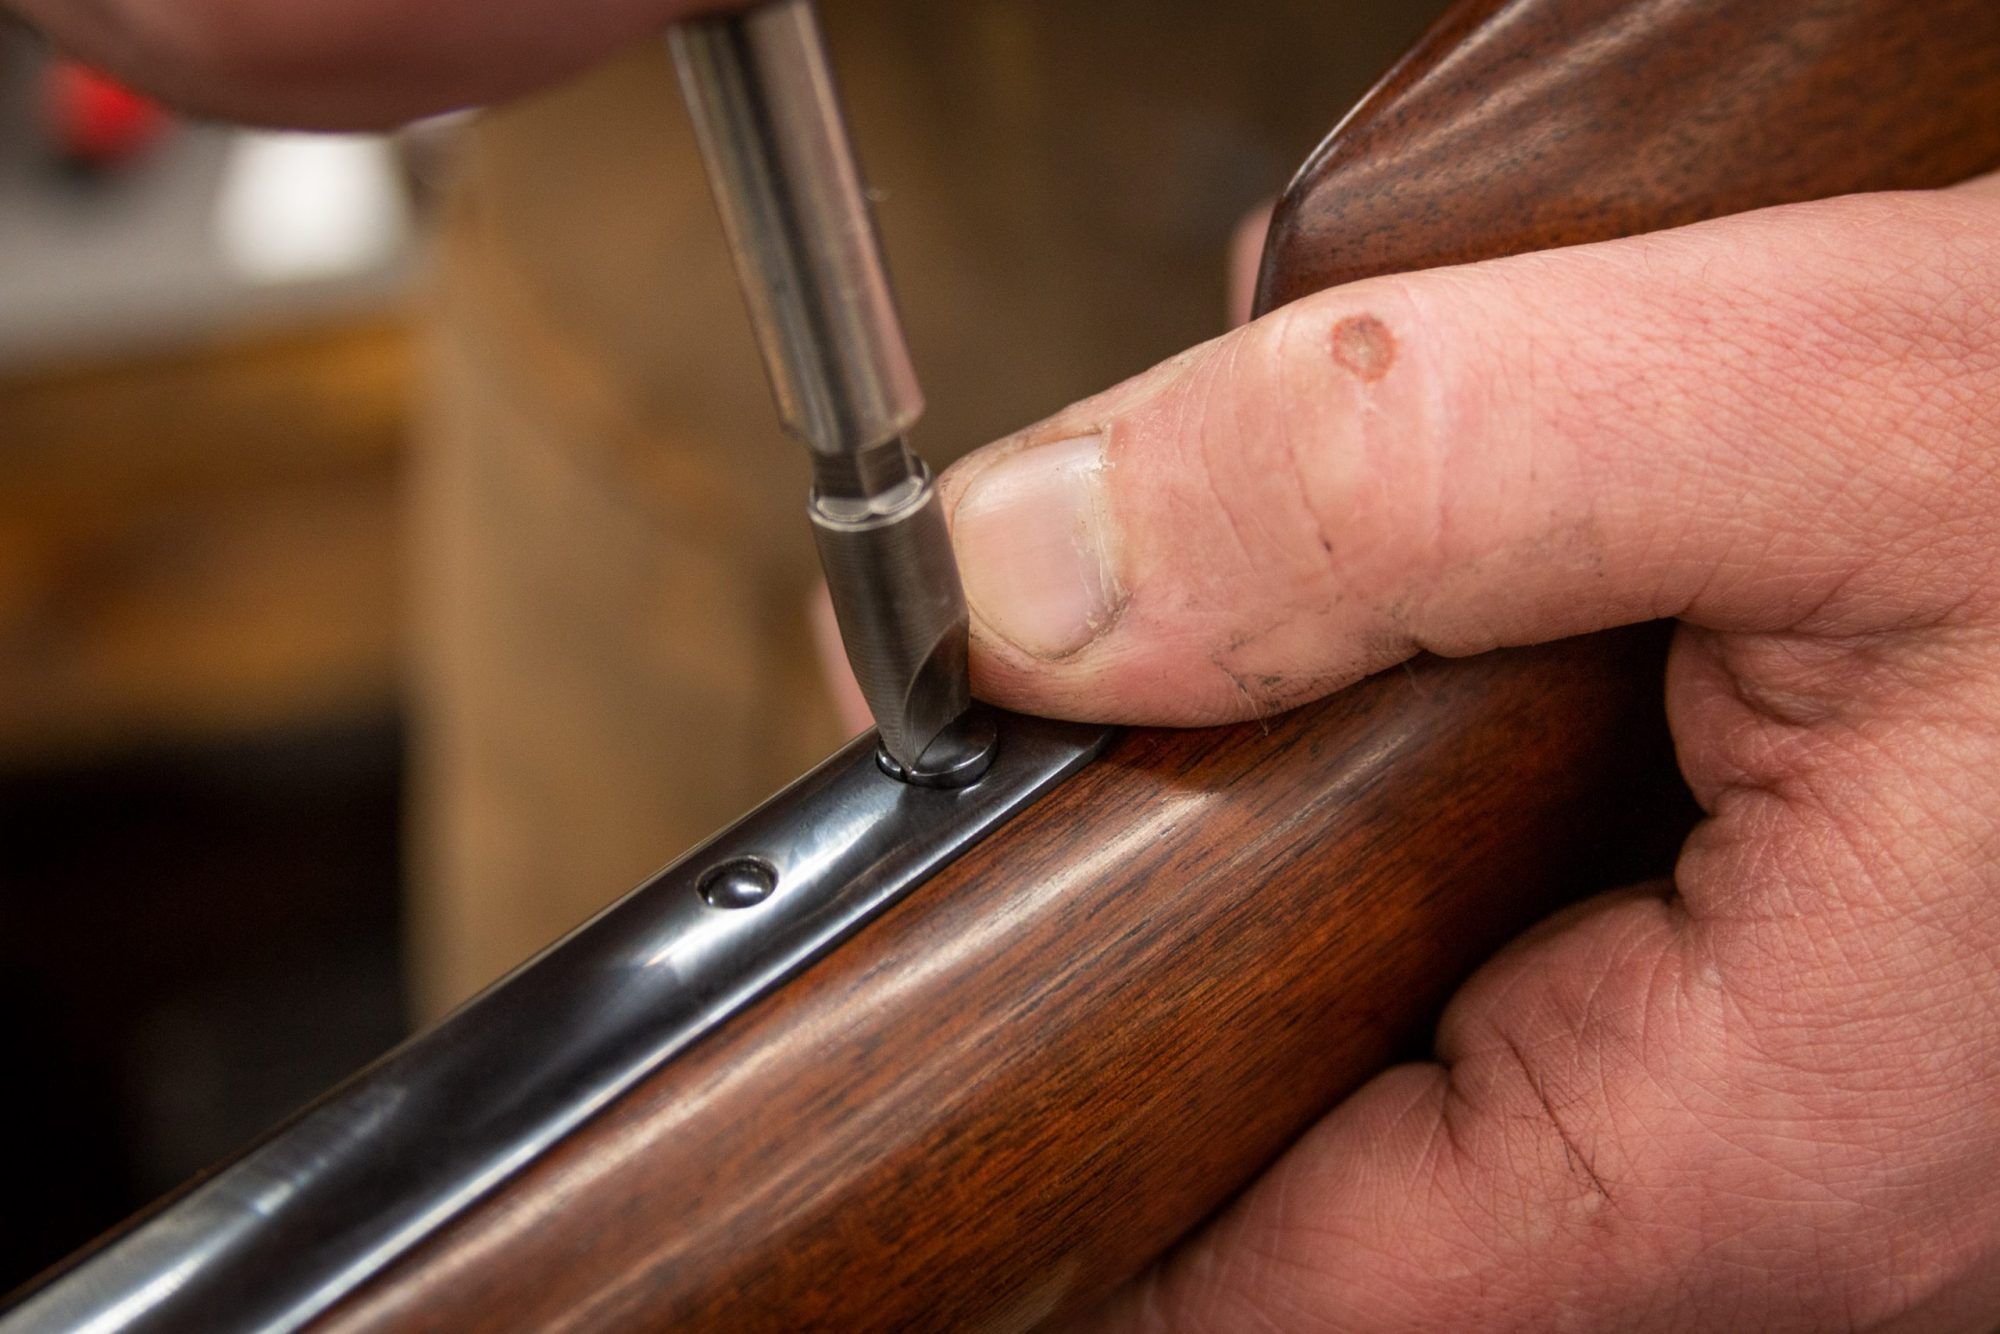 Photo of a rare Colt Model 1855 revolving 20 gauge shotgun during restoration by Turnbull Restoration of Bloomfield, NY